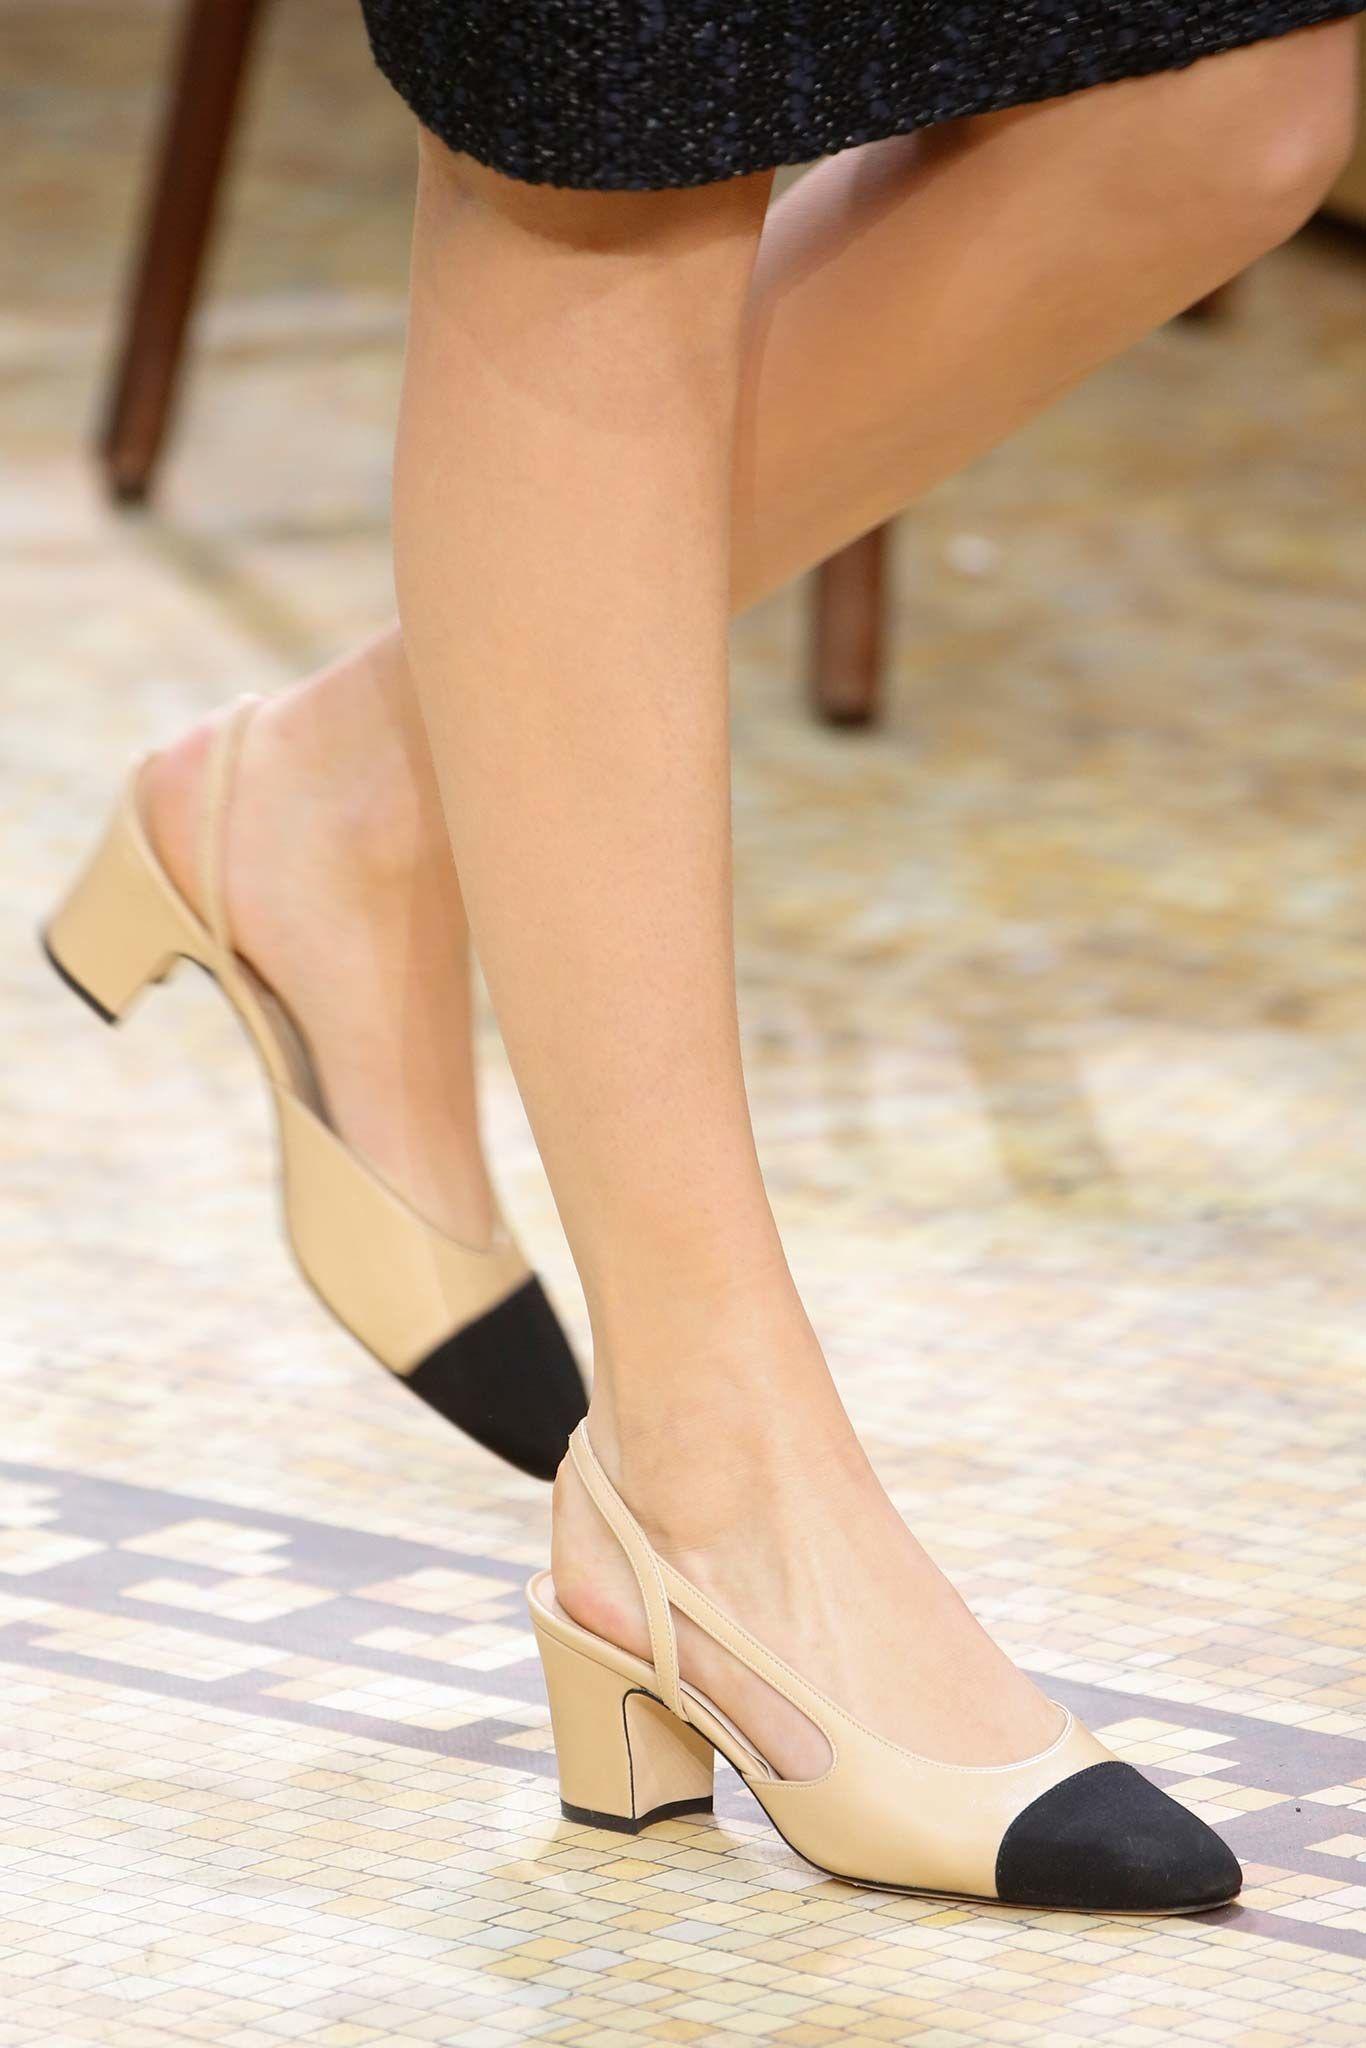 Chanel Fall 2015 Ready To Wear Fashion Show Chanel Slingback Slingback Shoes Pump Shoes